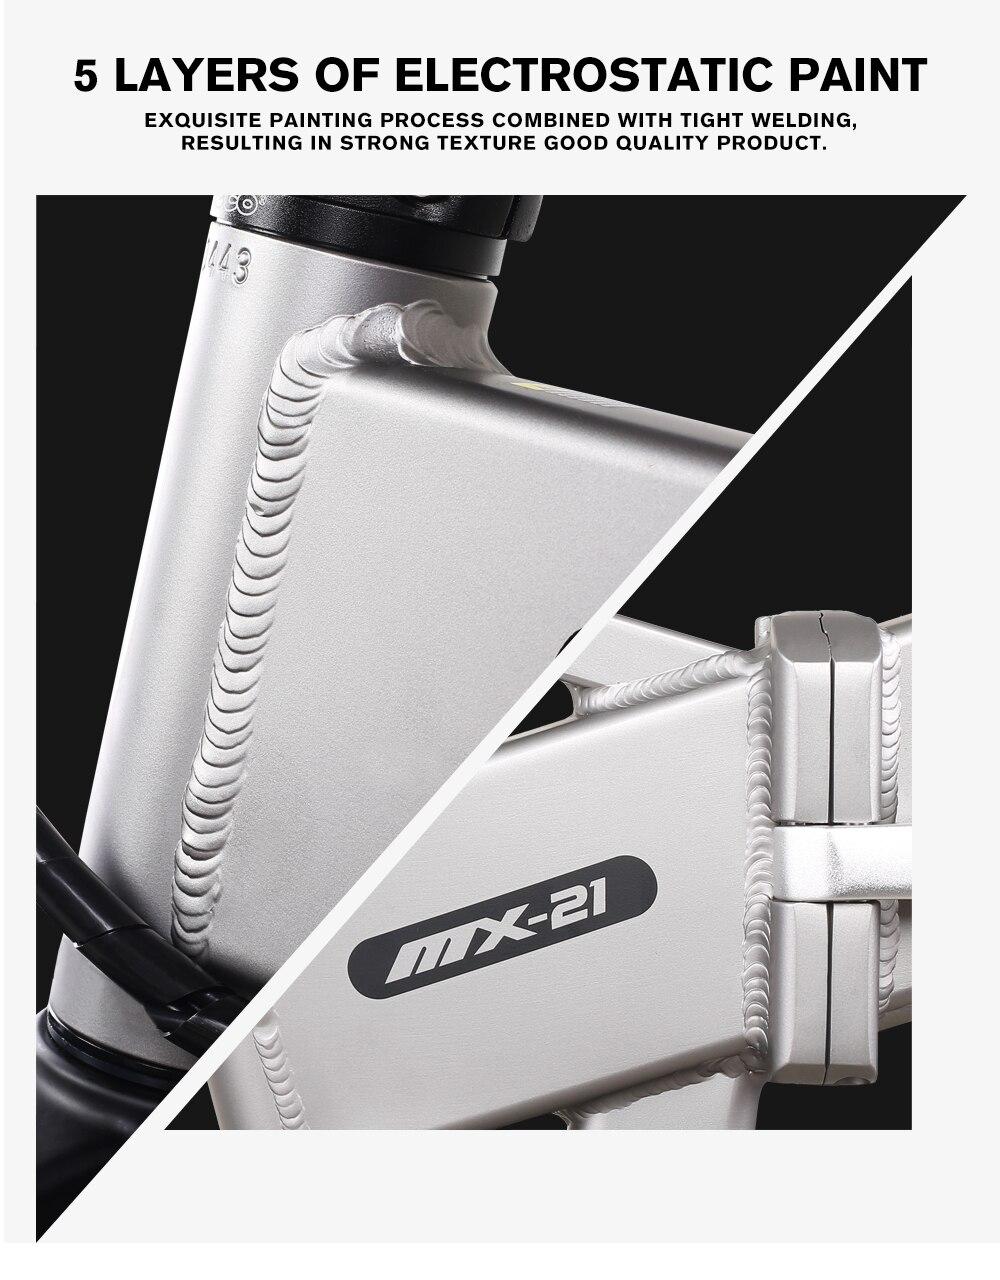 MX21-英文版上-新_17